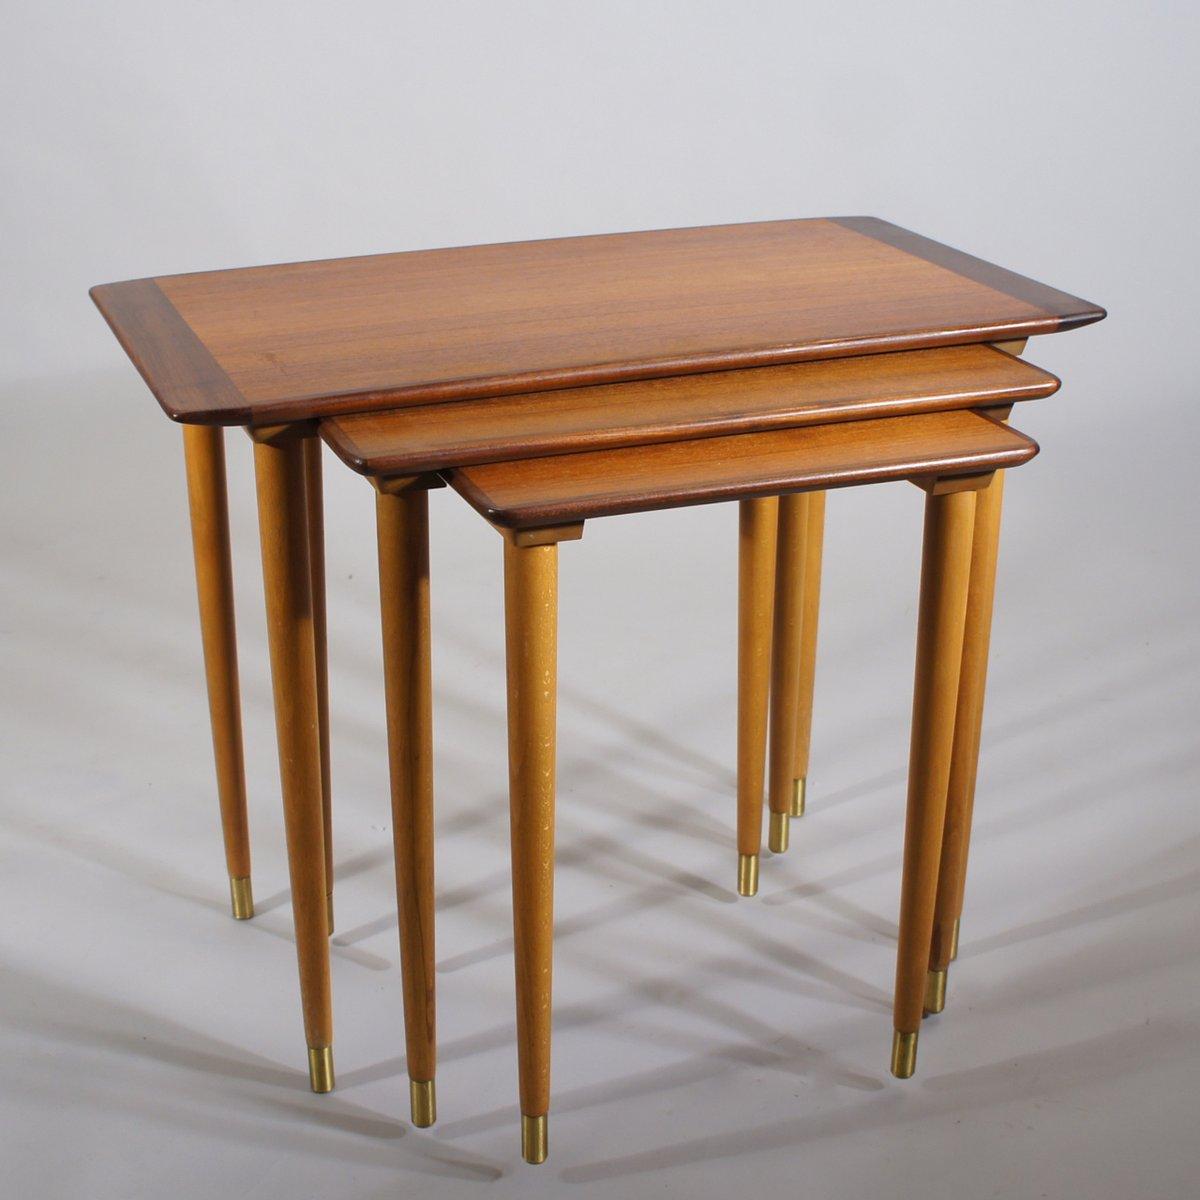 Vintage swedish nesting tables in teak s for sale at